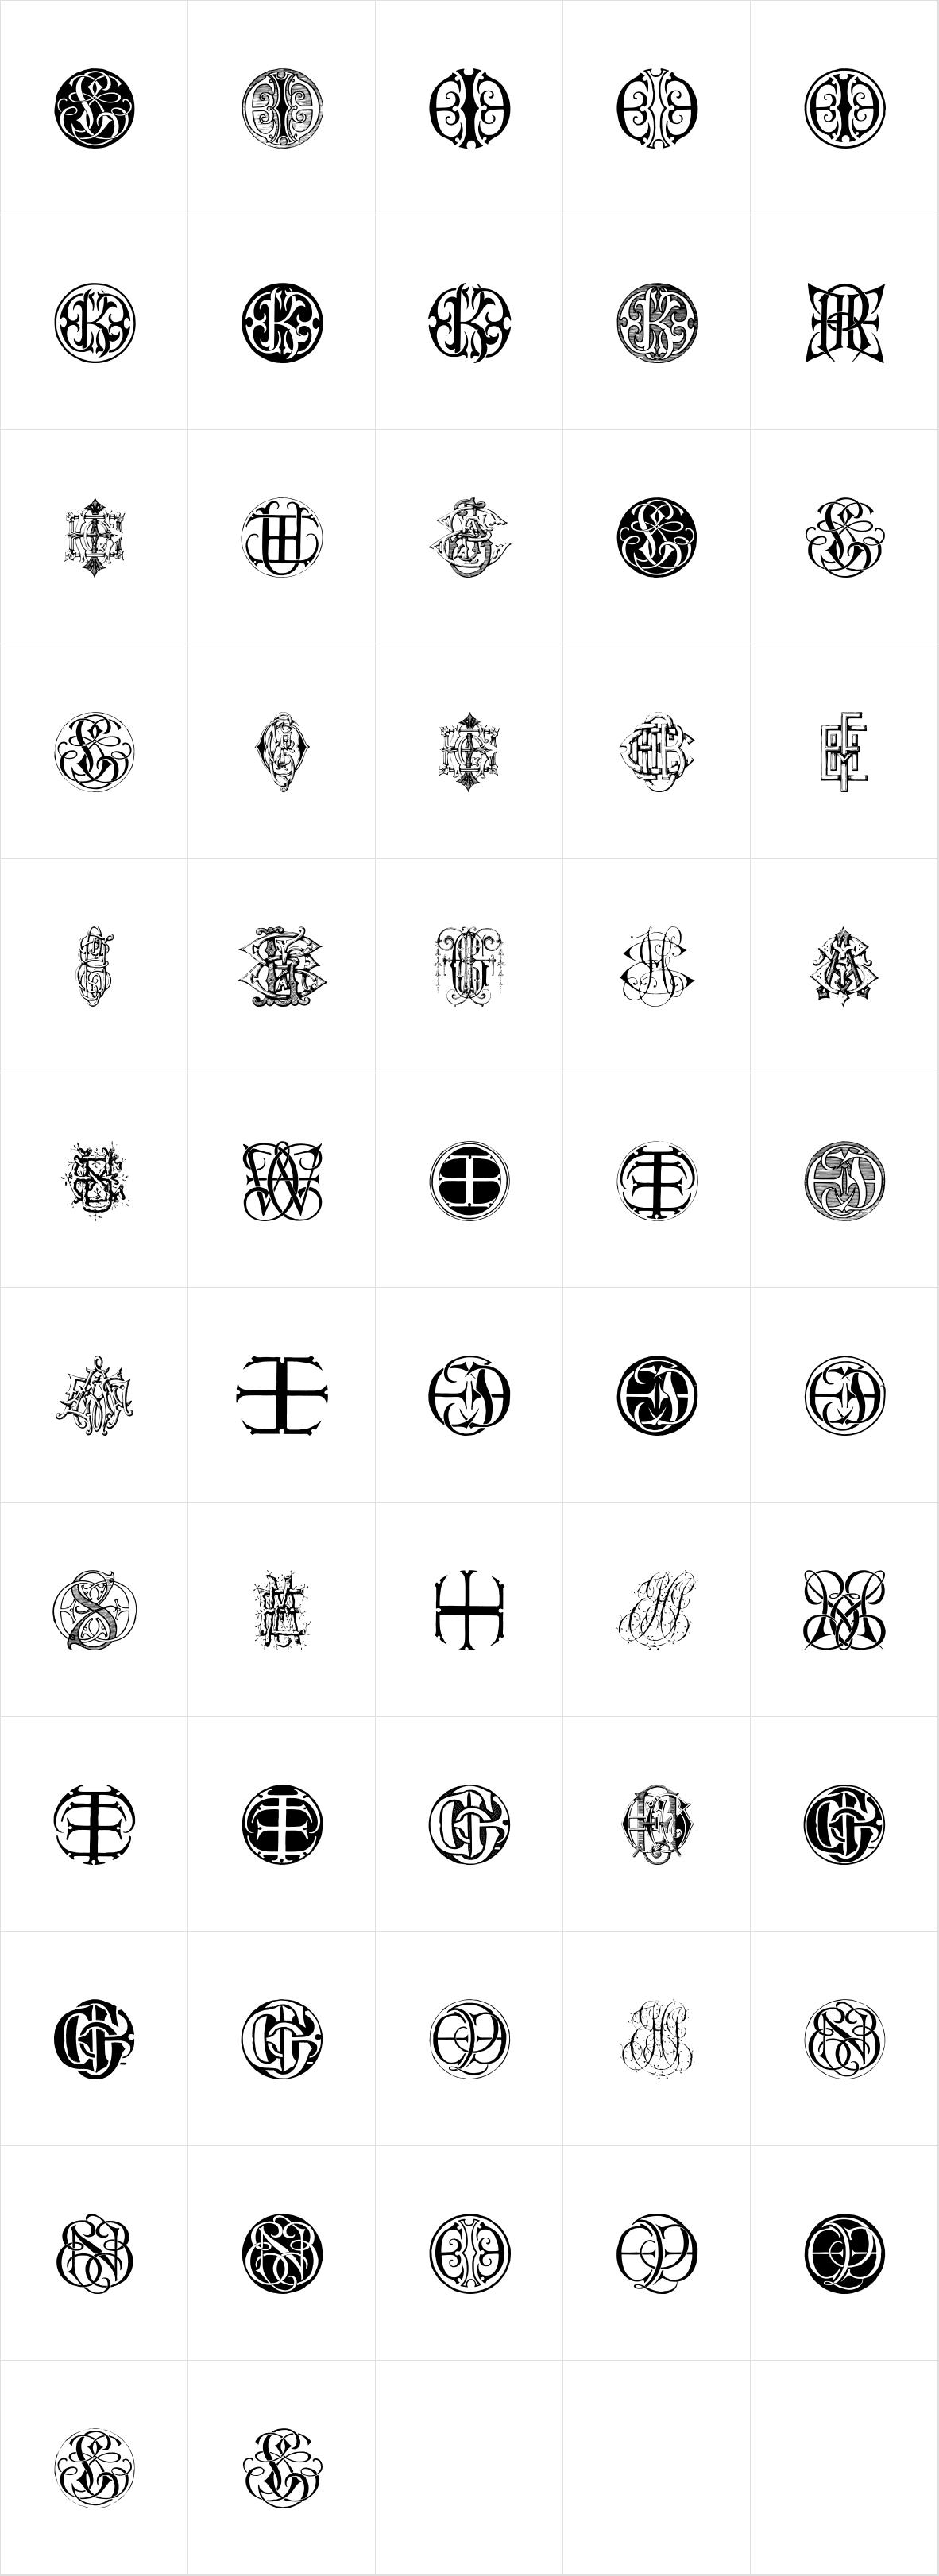 Intellecta Monograms Triple EEI FEJ